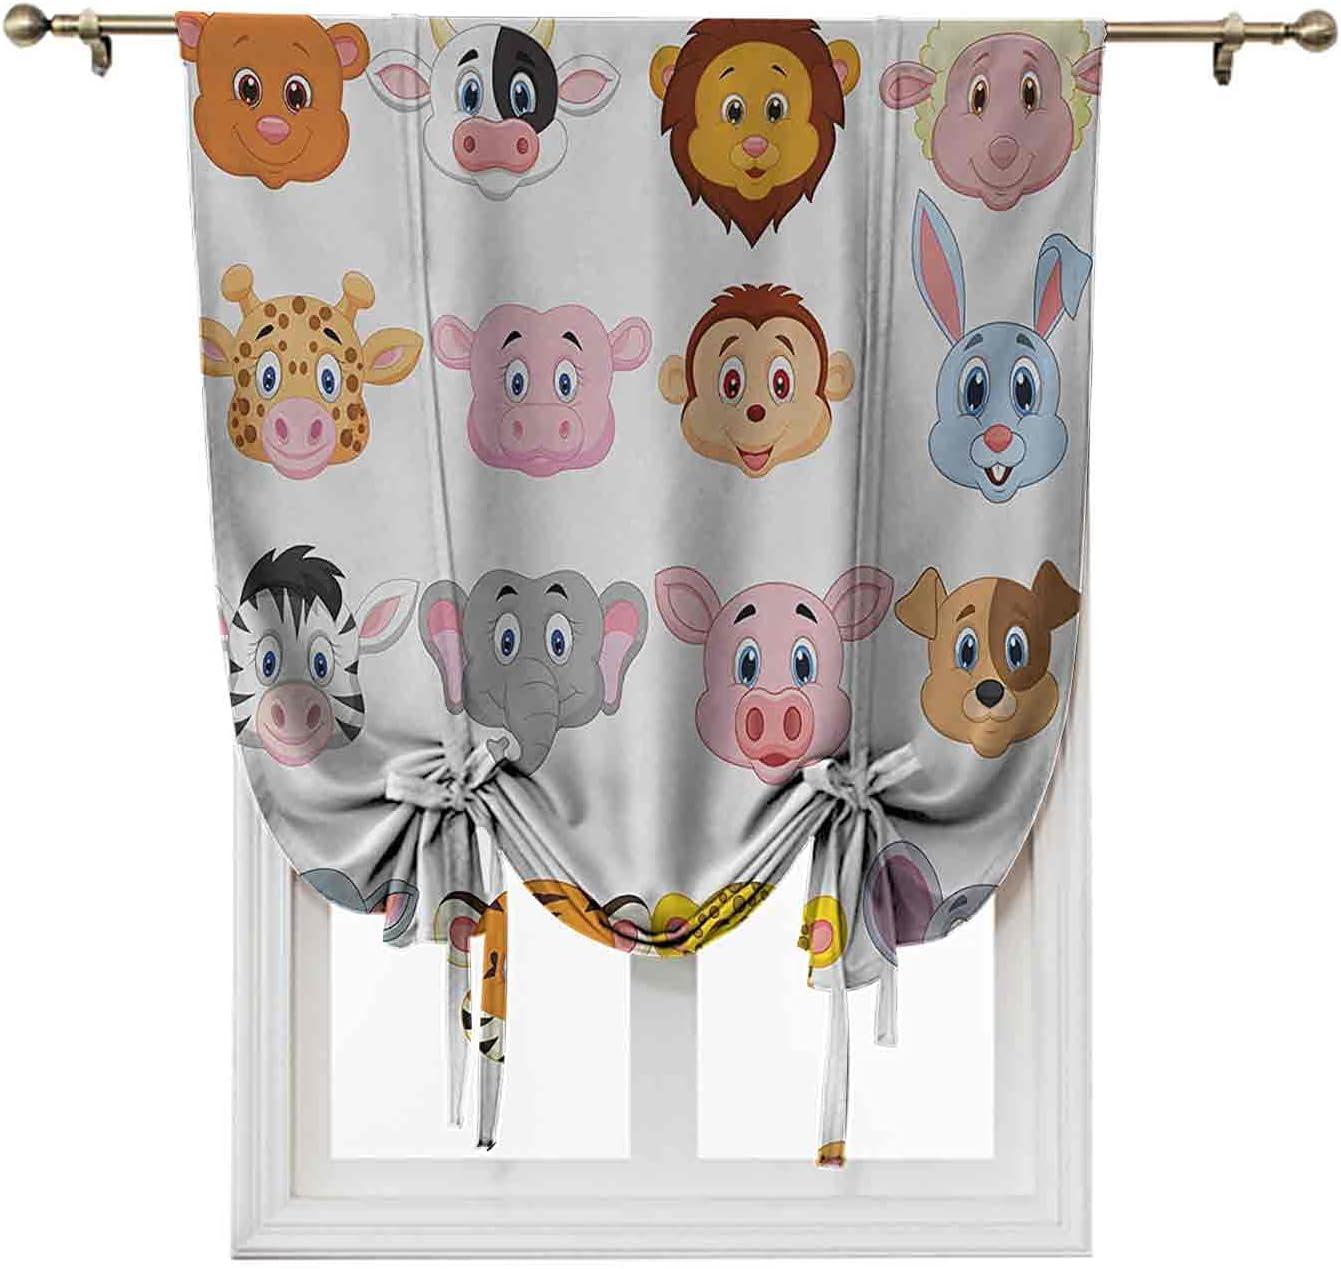 Cartoon Door Curtains Large-scale sale Adjustable Valance Fees free!! Kids Balloon Th Blind